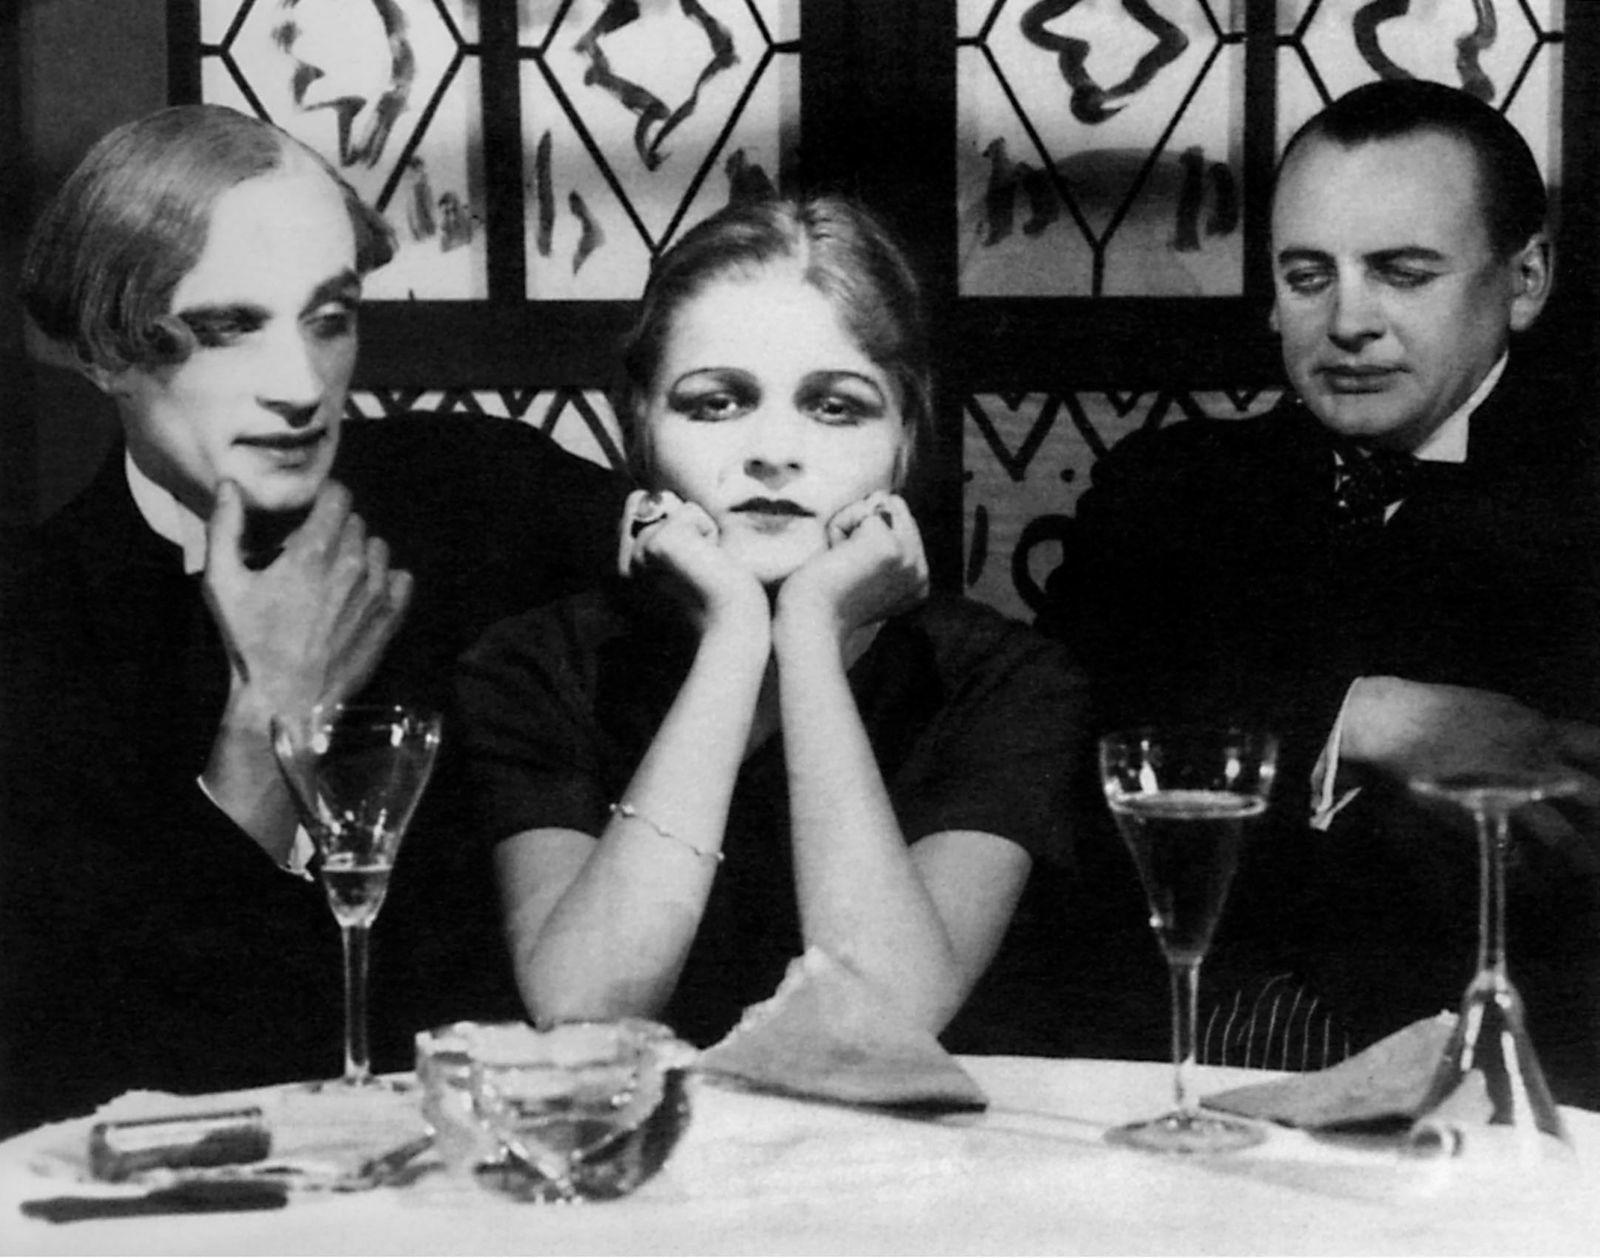 Anita Berber - Conrad Veidt, Anita Berber, Reinhold Schunzel Film: Eerie Tales (1926) 01 May 1919